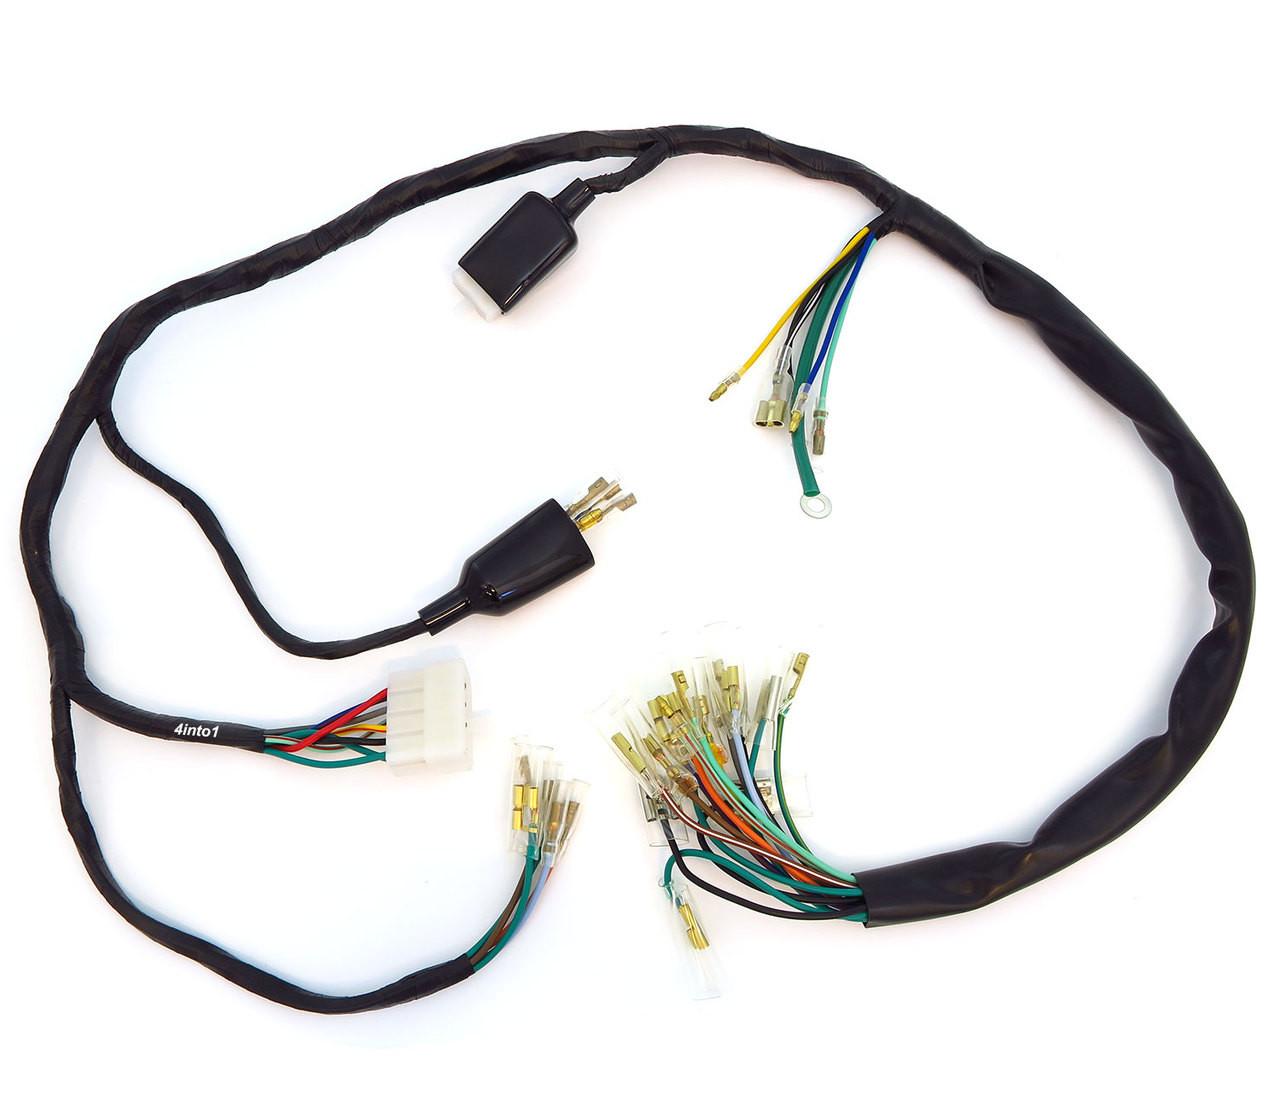 honda ss125 wiring harness wiring schematic diagram engine control module wiring harness main wiring harness 32100 323 040 honda cb500k 1972 1973 kohler engine wiring harness diagram image